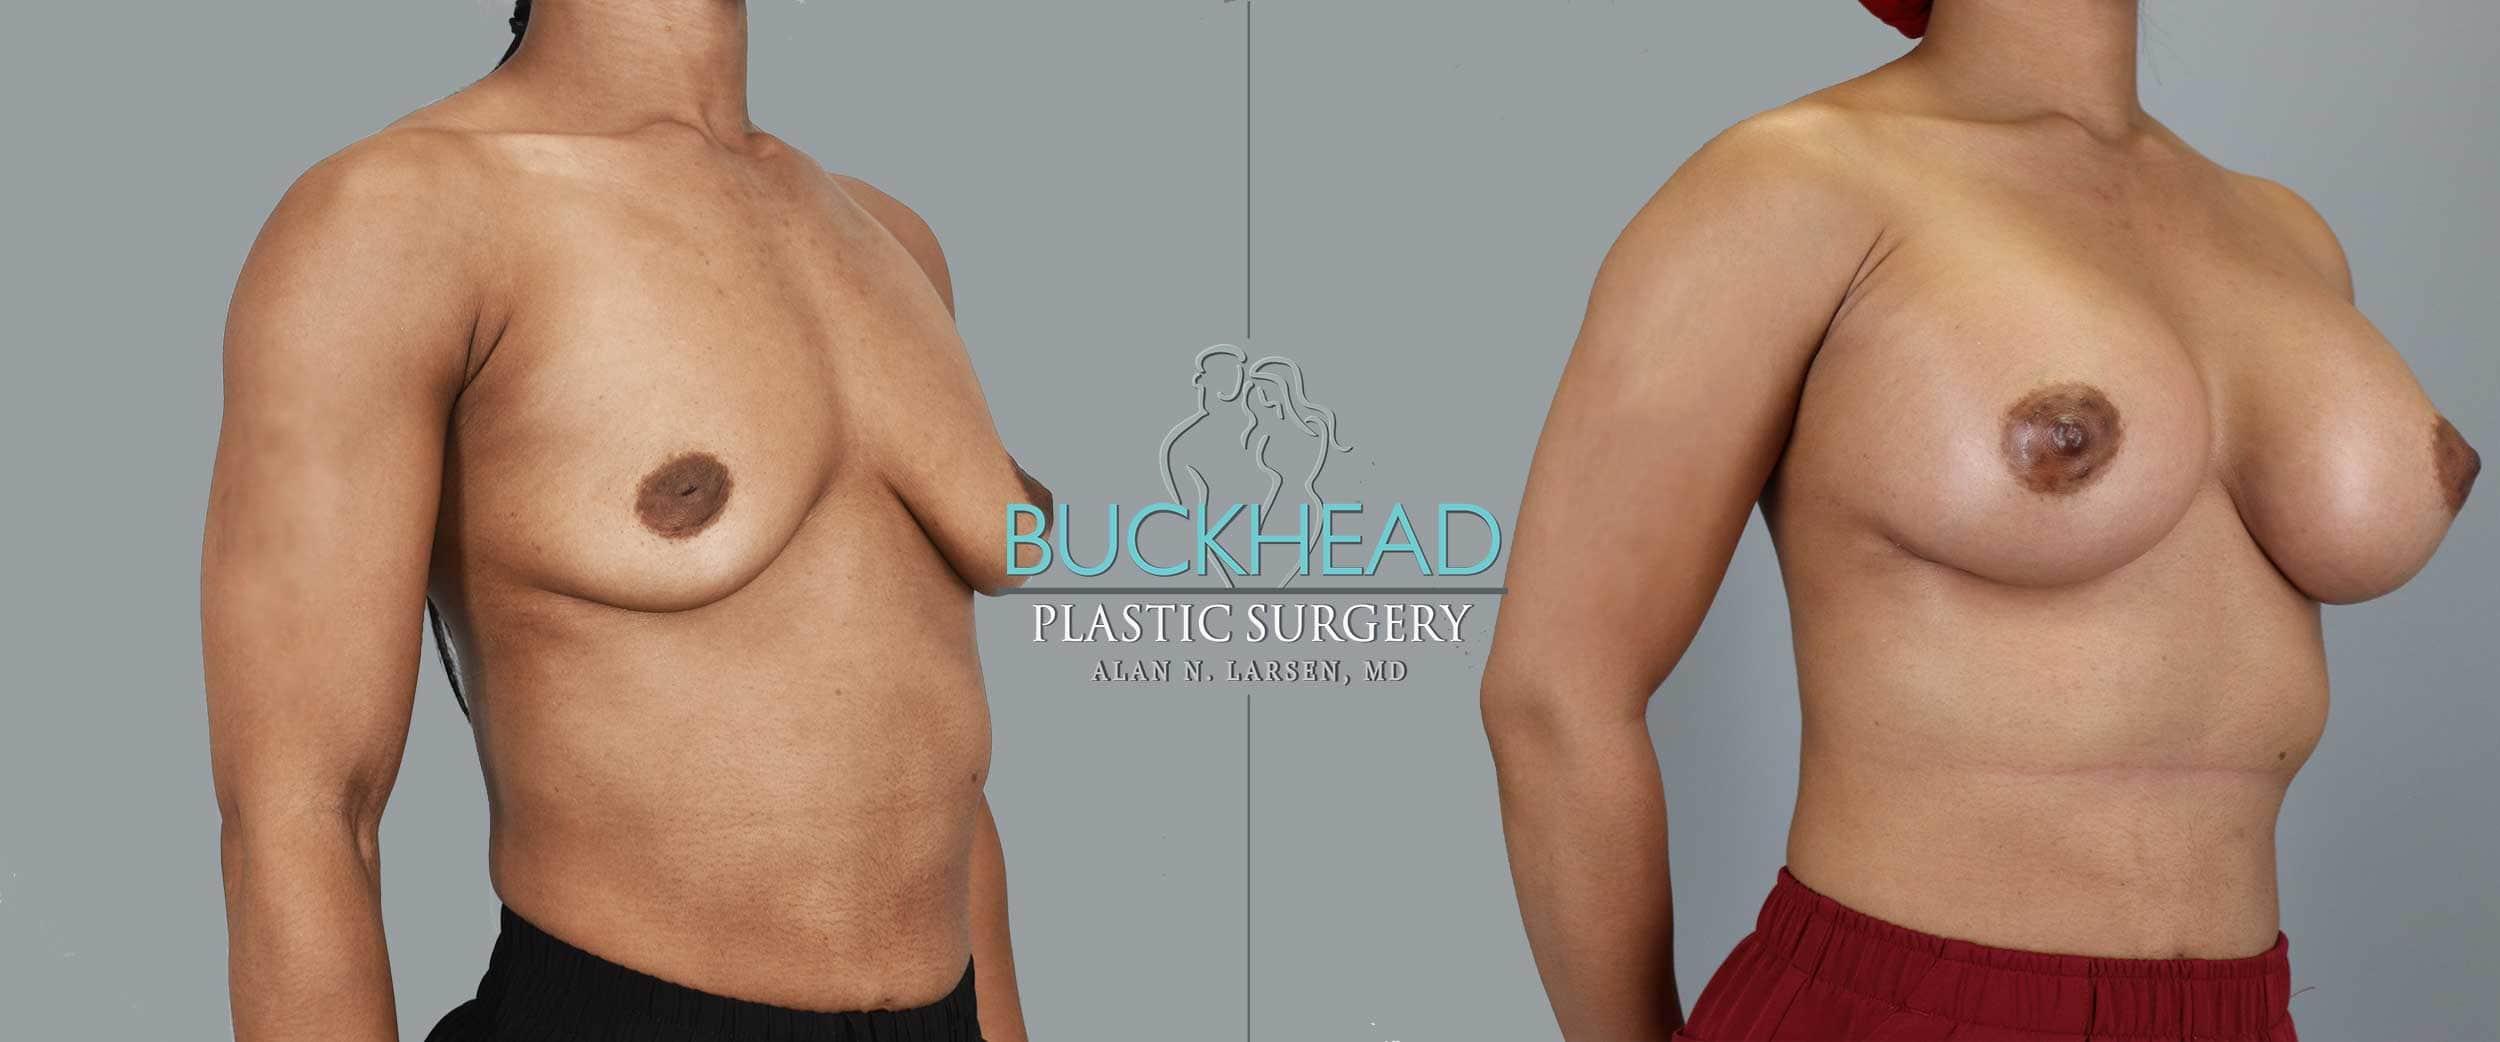 Before and After Photo Gallery | Breast Aug | Buckhead Plastic Surgery | Alan N. Larsen, MD | Board-Certified Plastic Surgeon | Atlanta GA